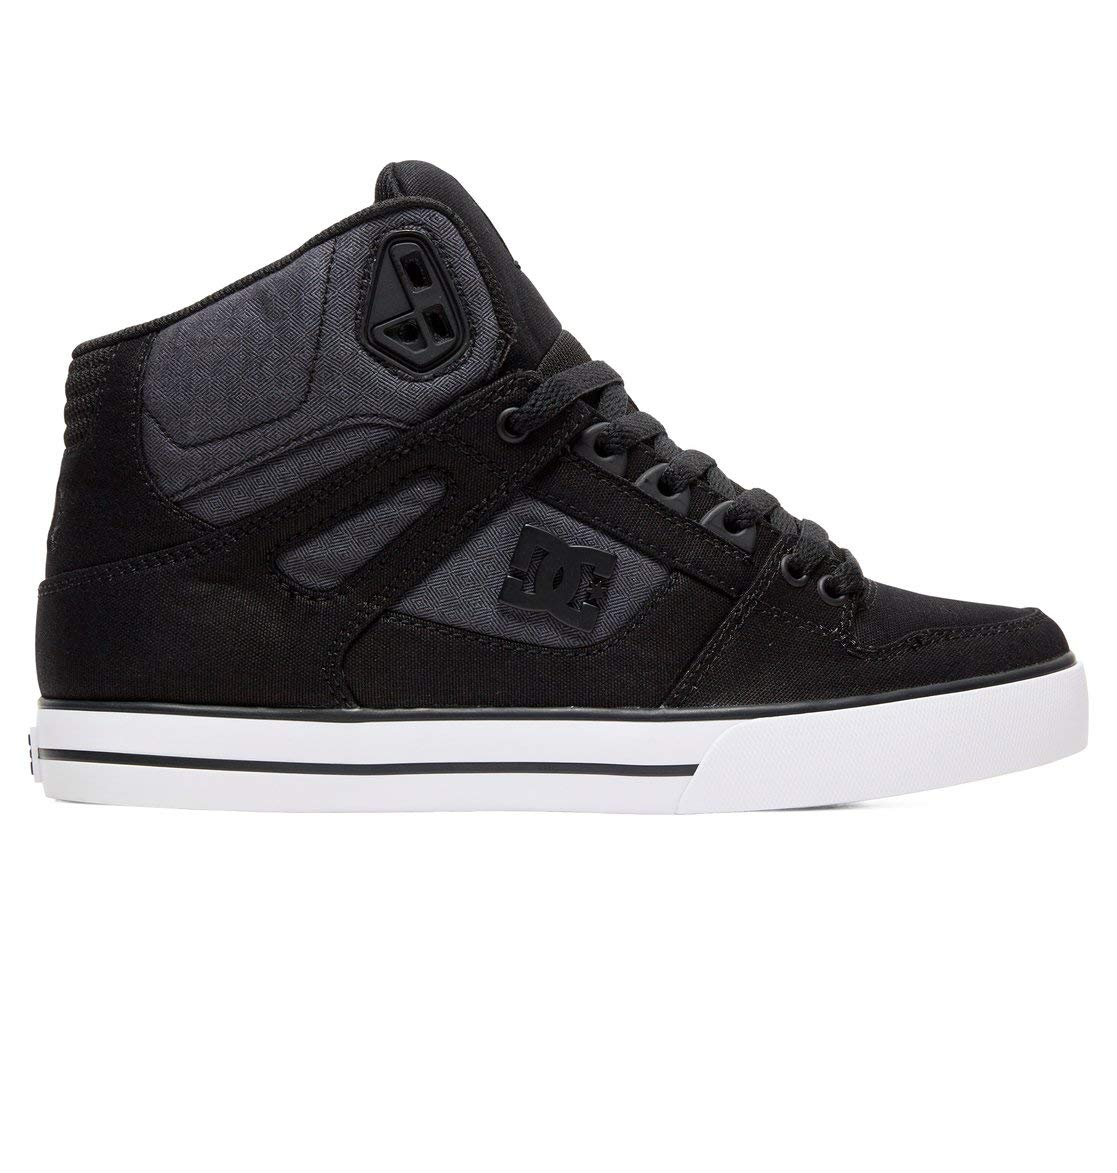 Wc For Dc De HommeNoirblack Pure Se MenChaussures Tx Shoes Eu Used Bkz42 5 Dark high top Skateboard POwkTluXZi